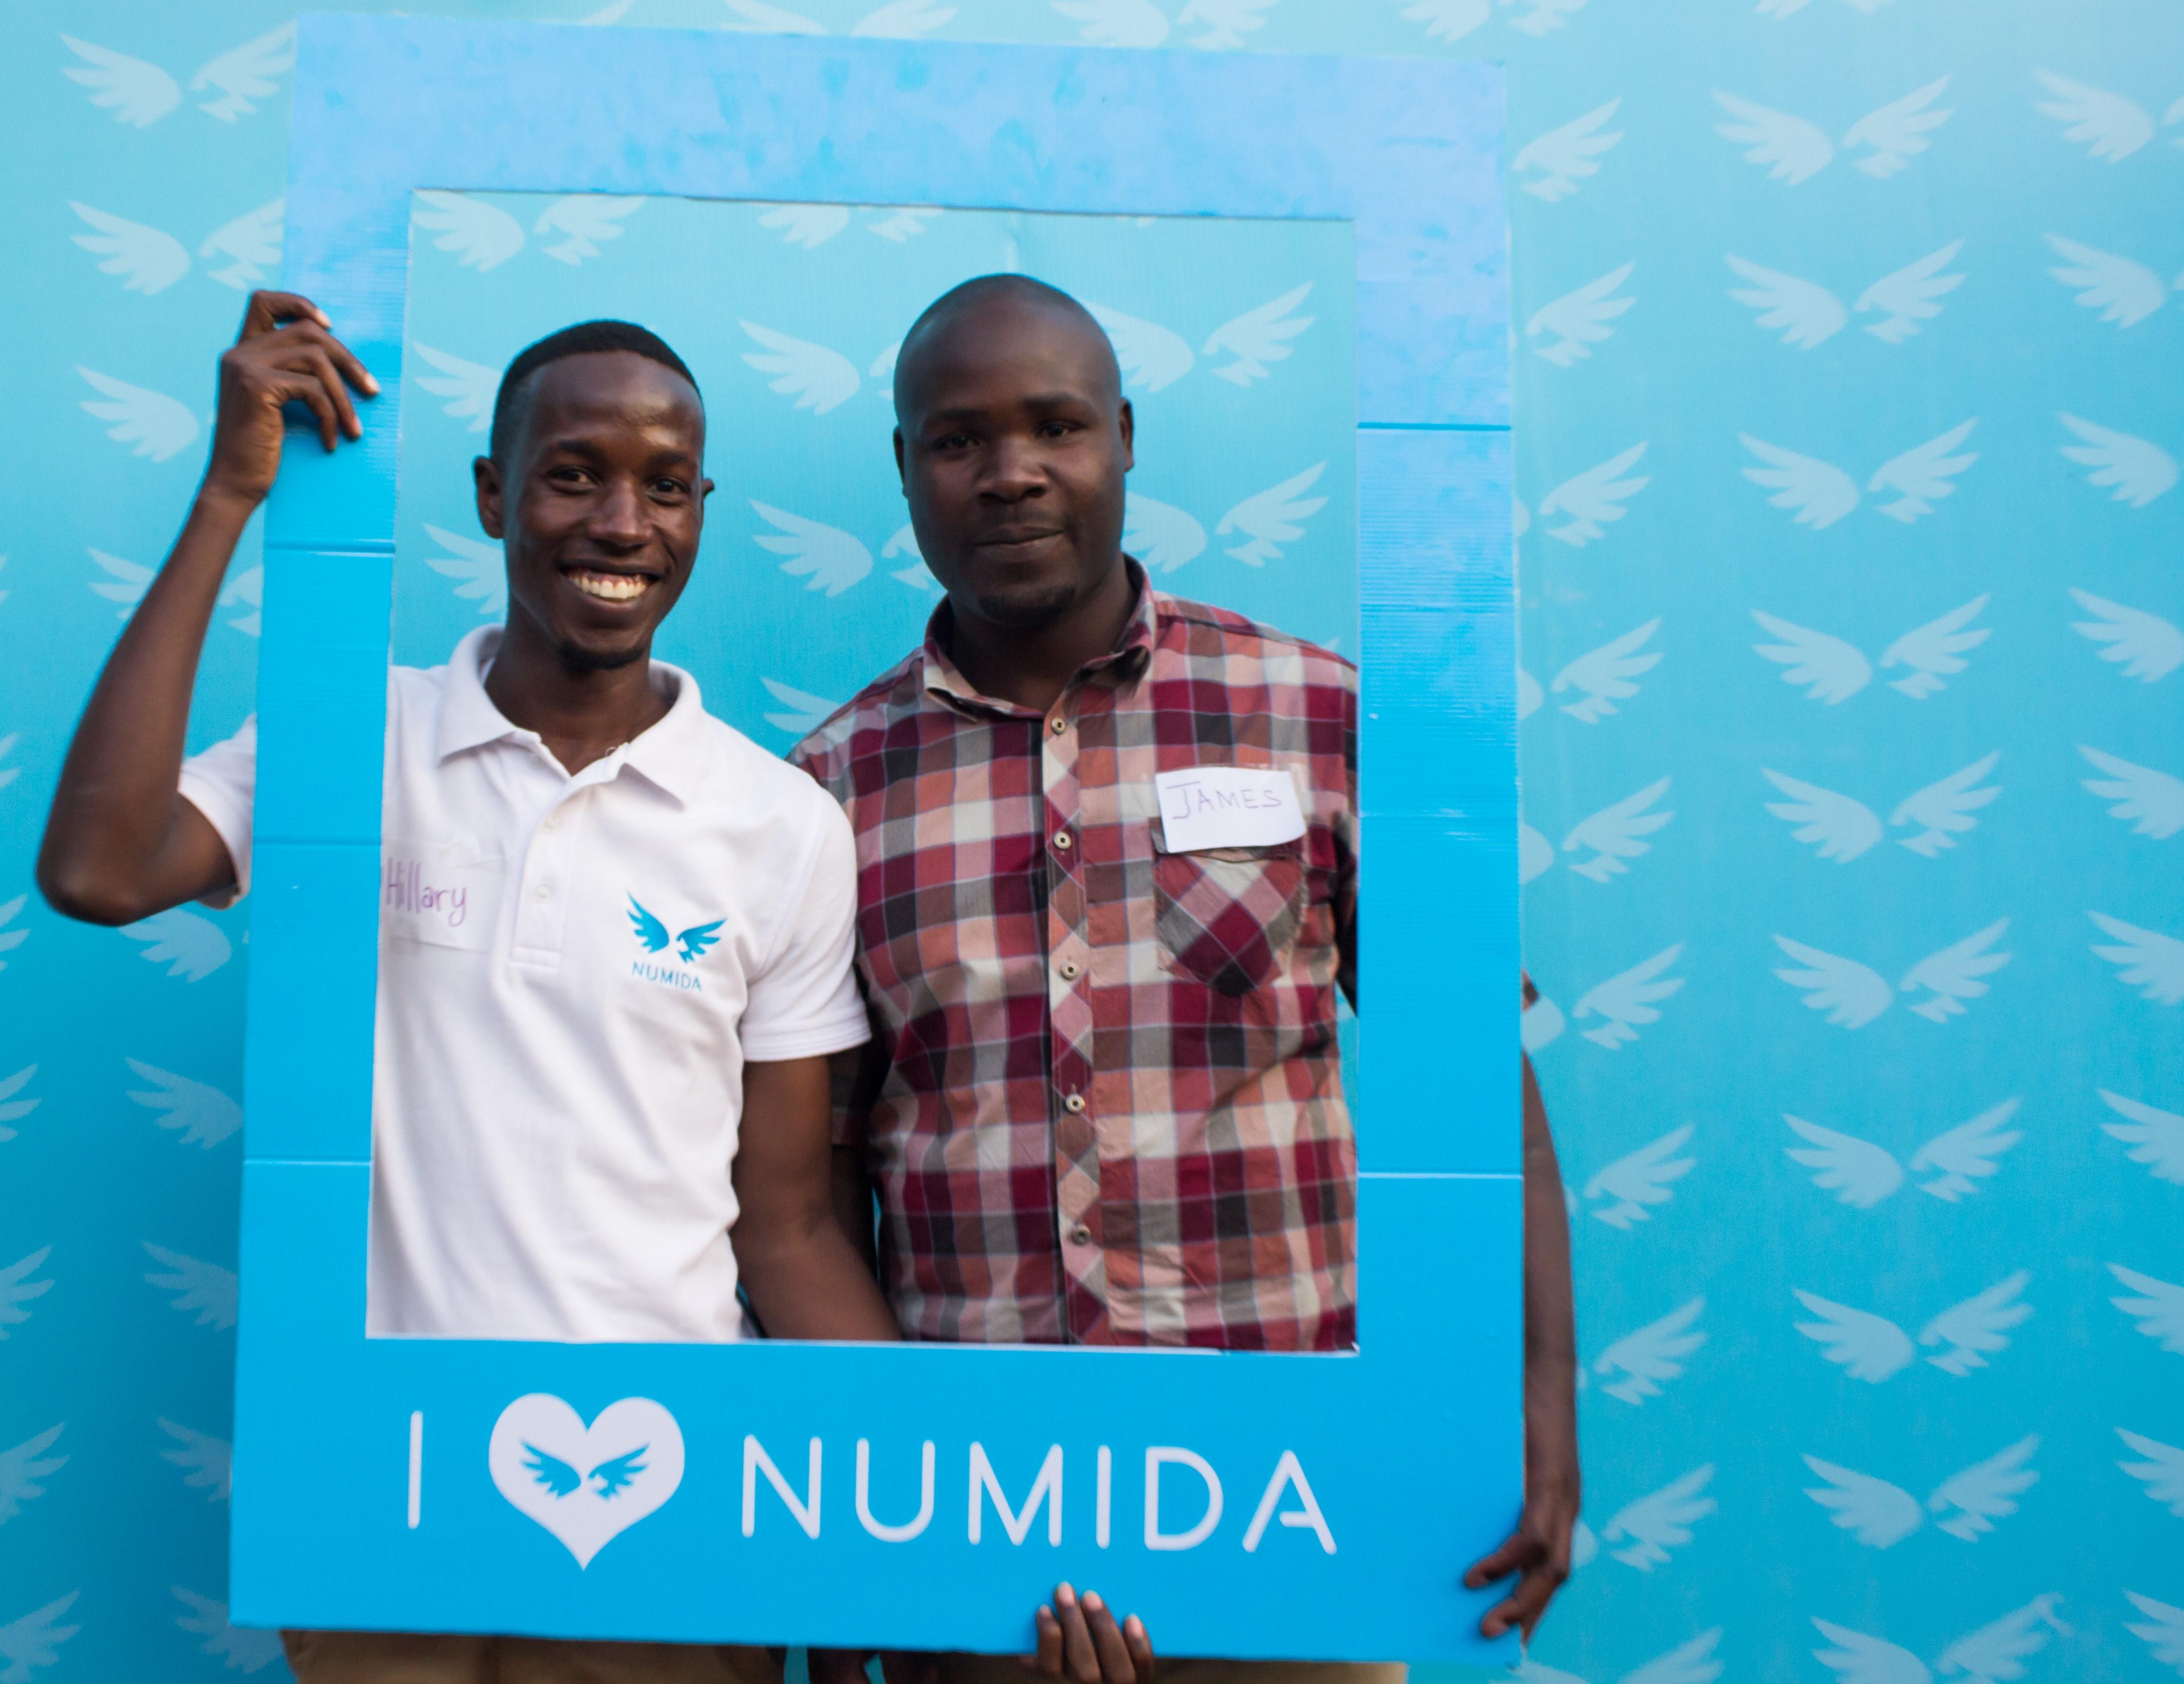 MFS Africa leads $2.3M seed round in Ugandan fintech startup Numida